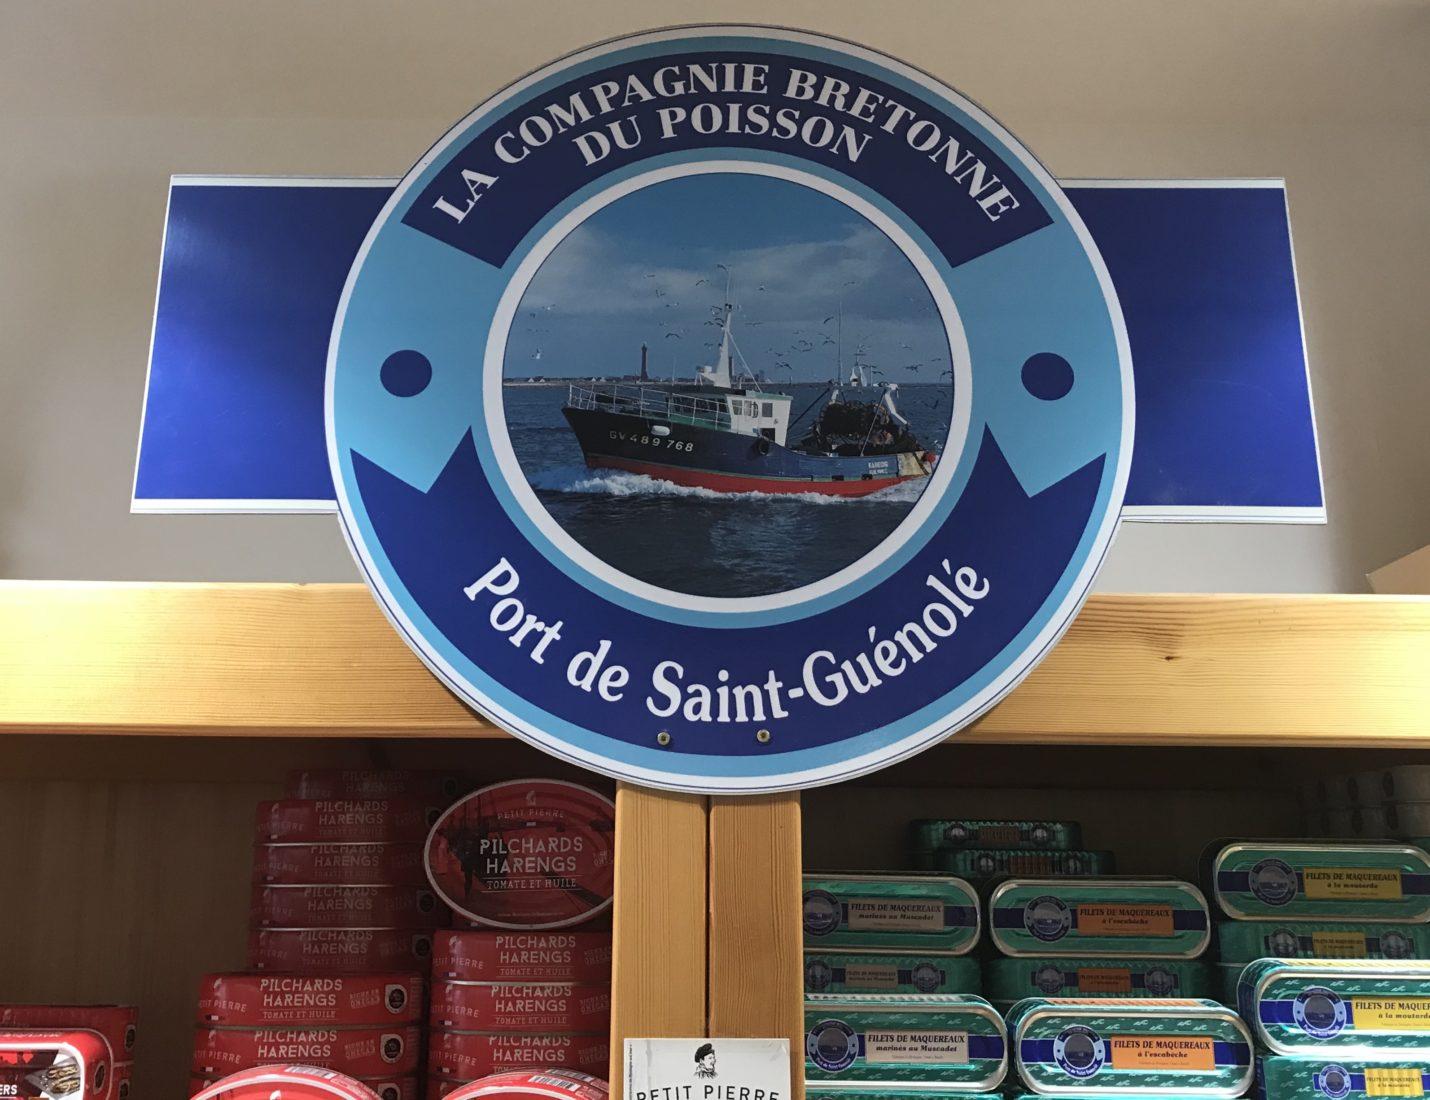 compagnie bretonne du poisson